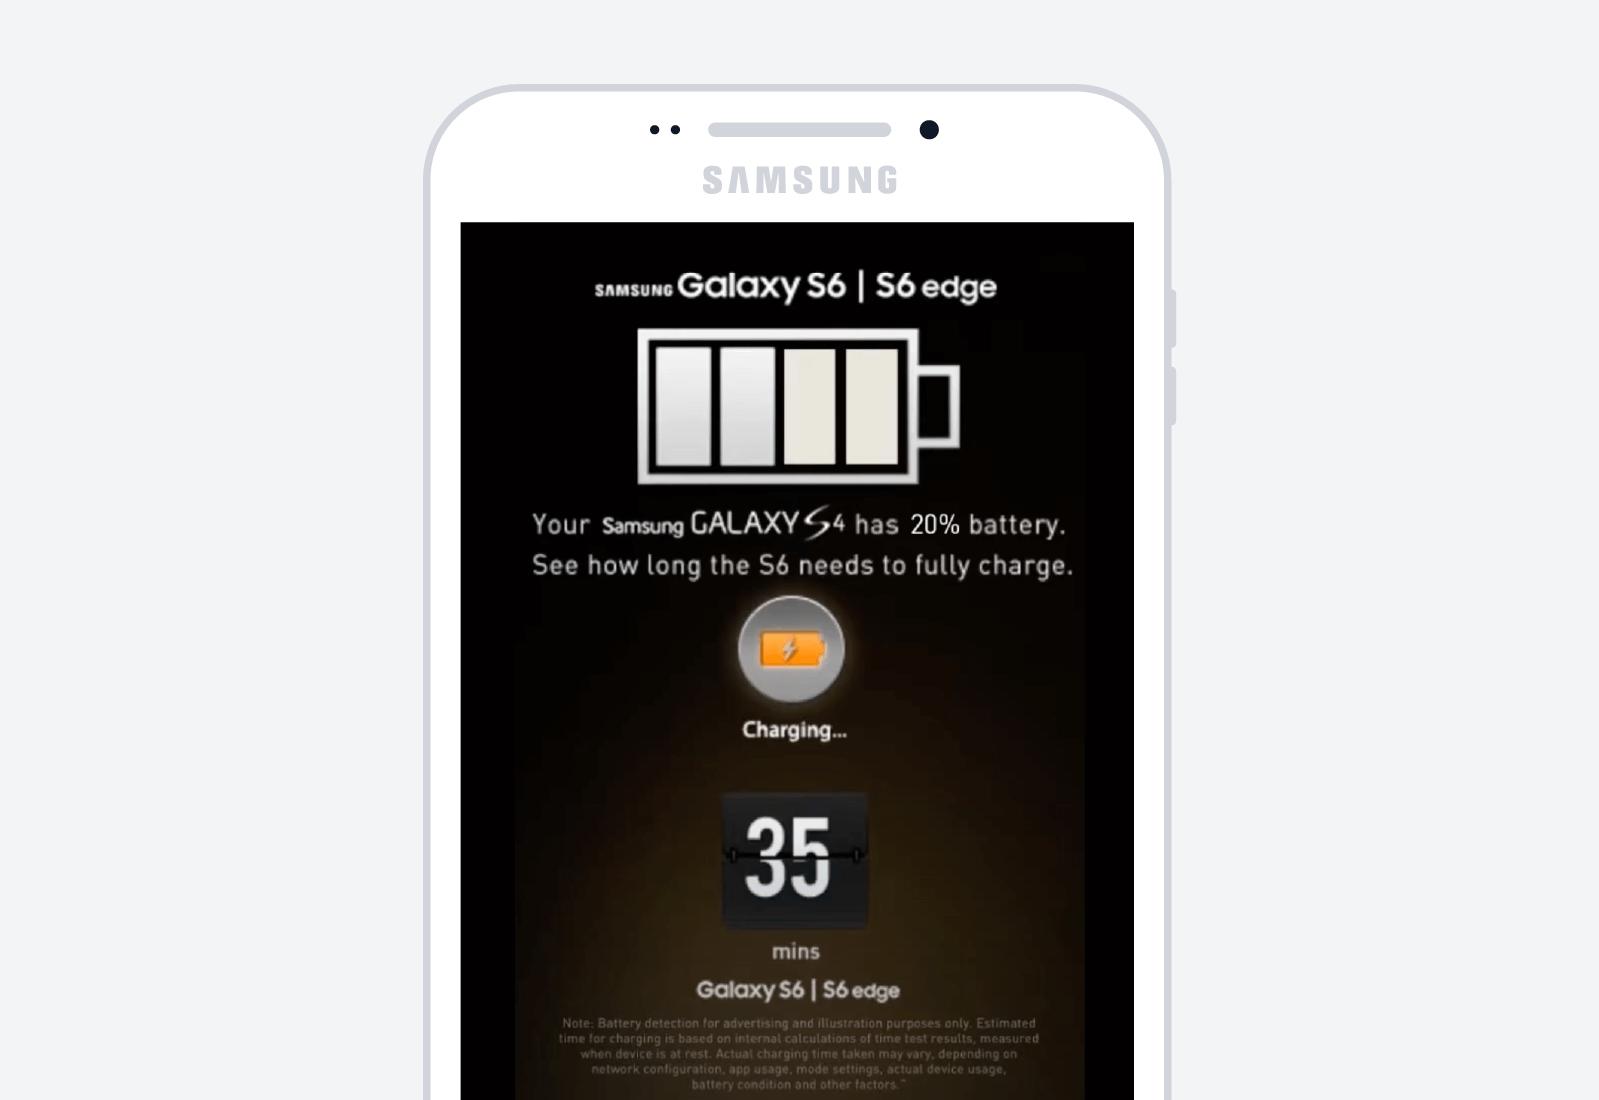 samsung mobile advertisement